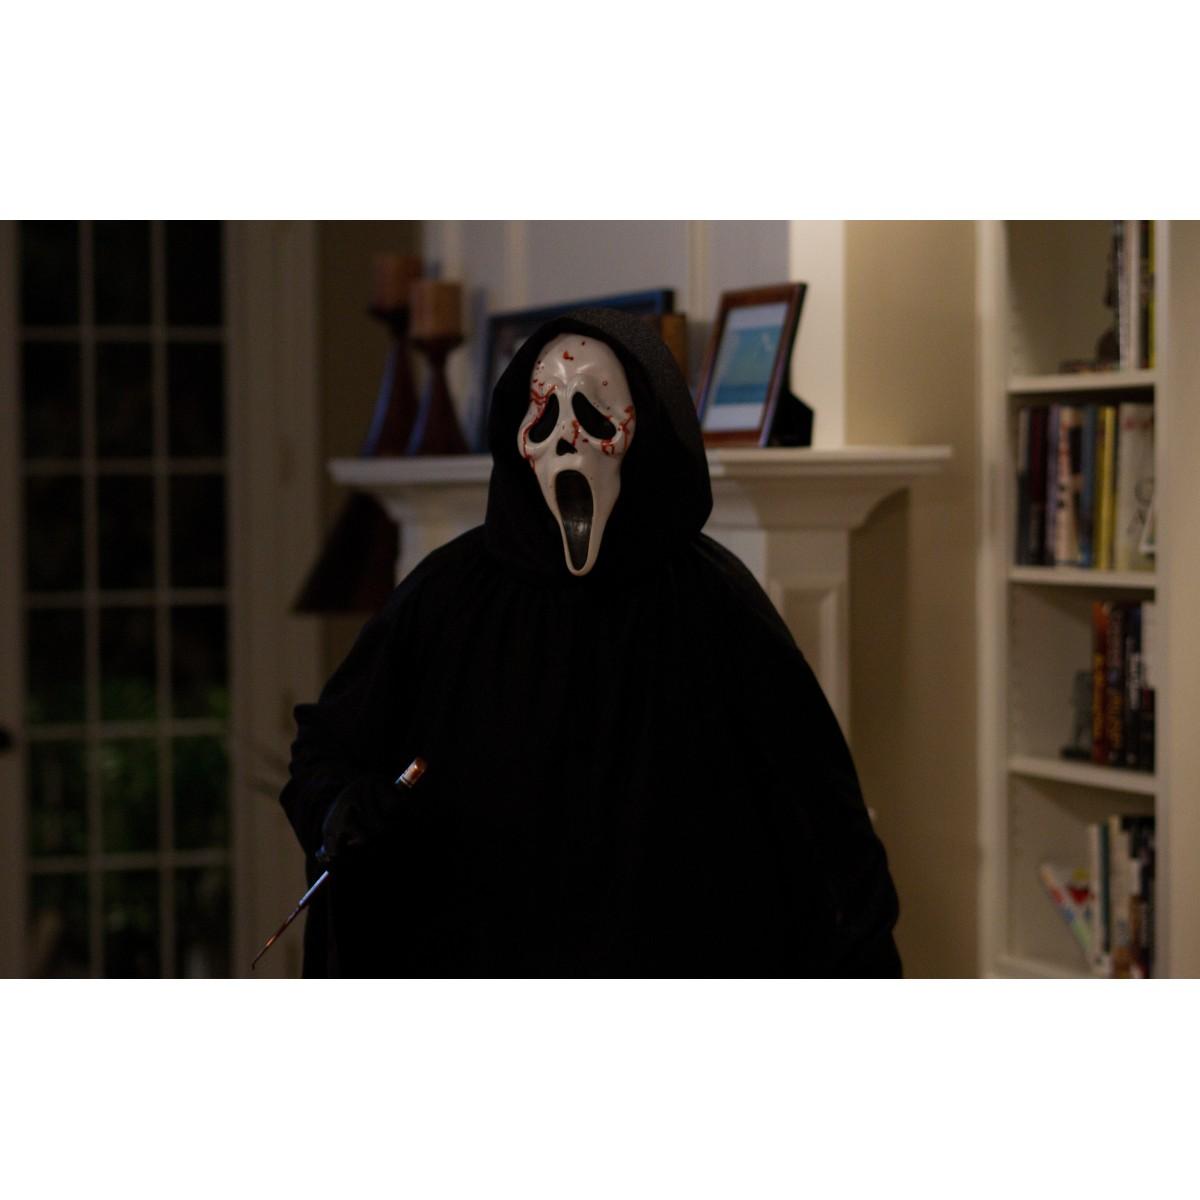 Photo Scream 4